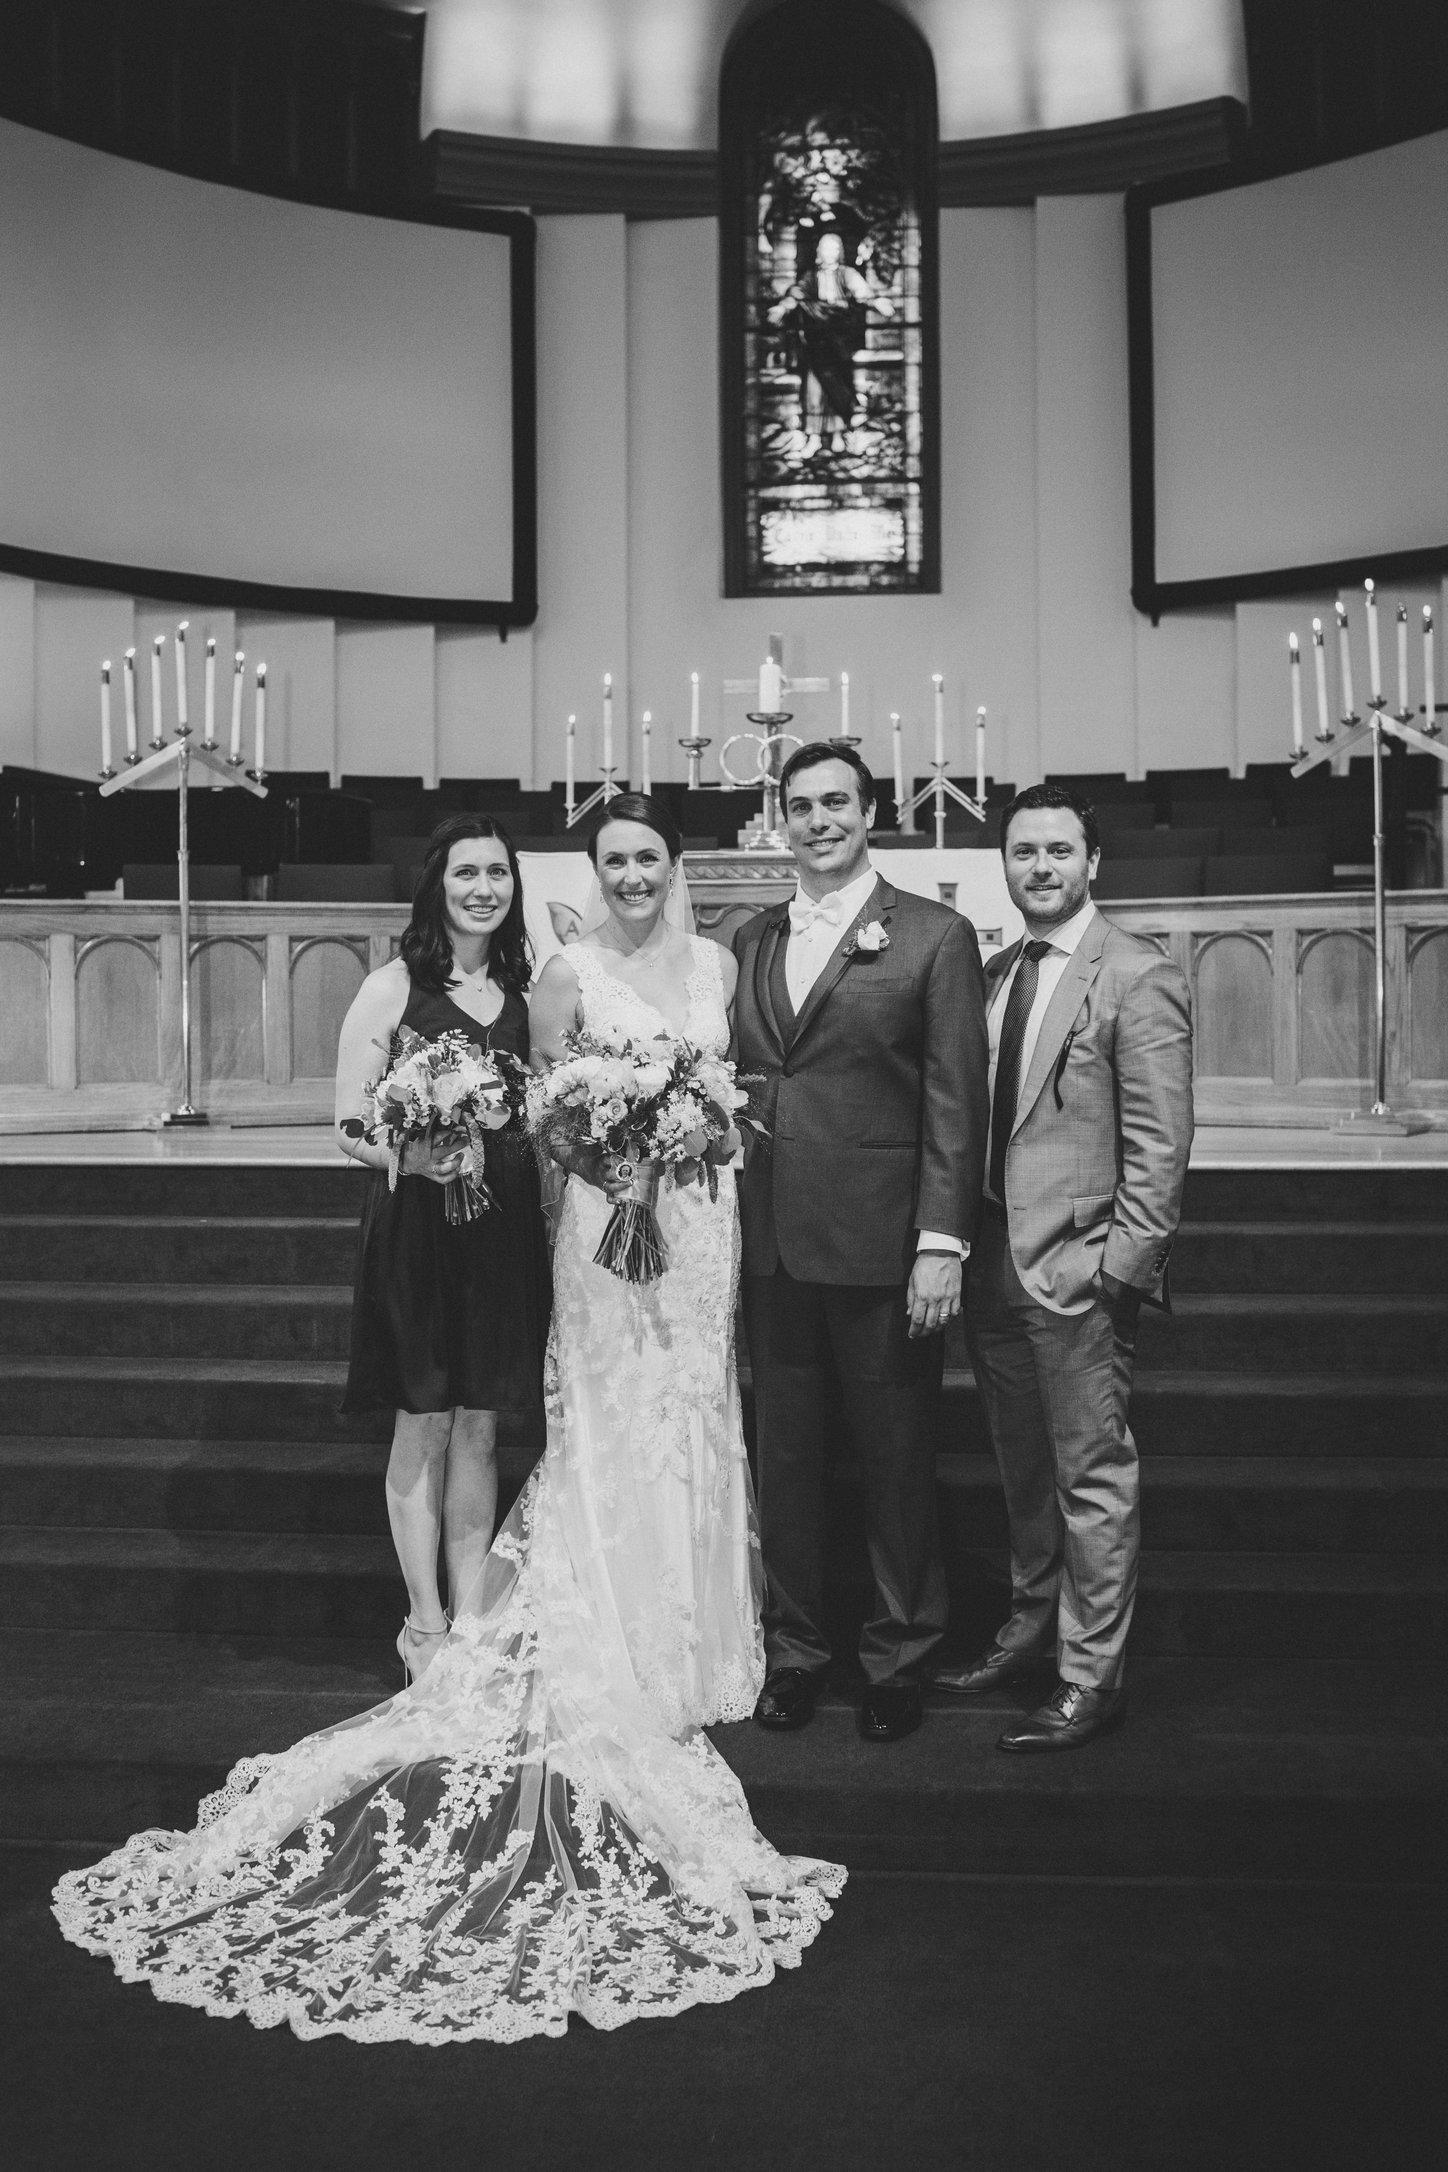 SandC-wedding-262.jpg